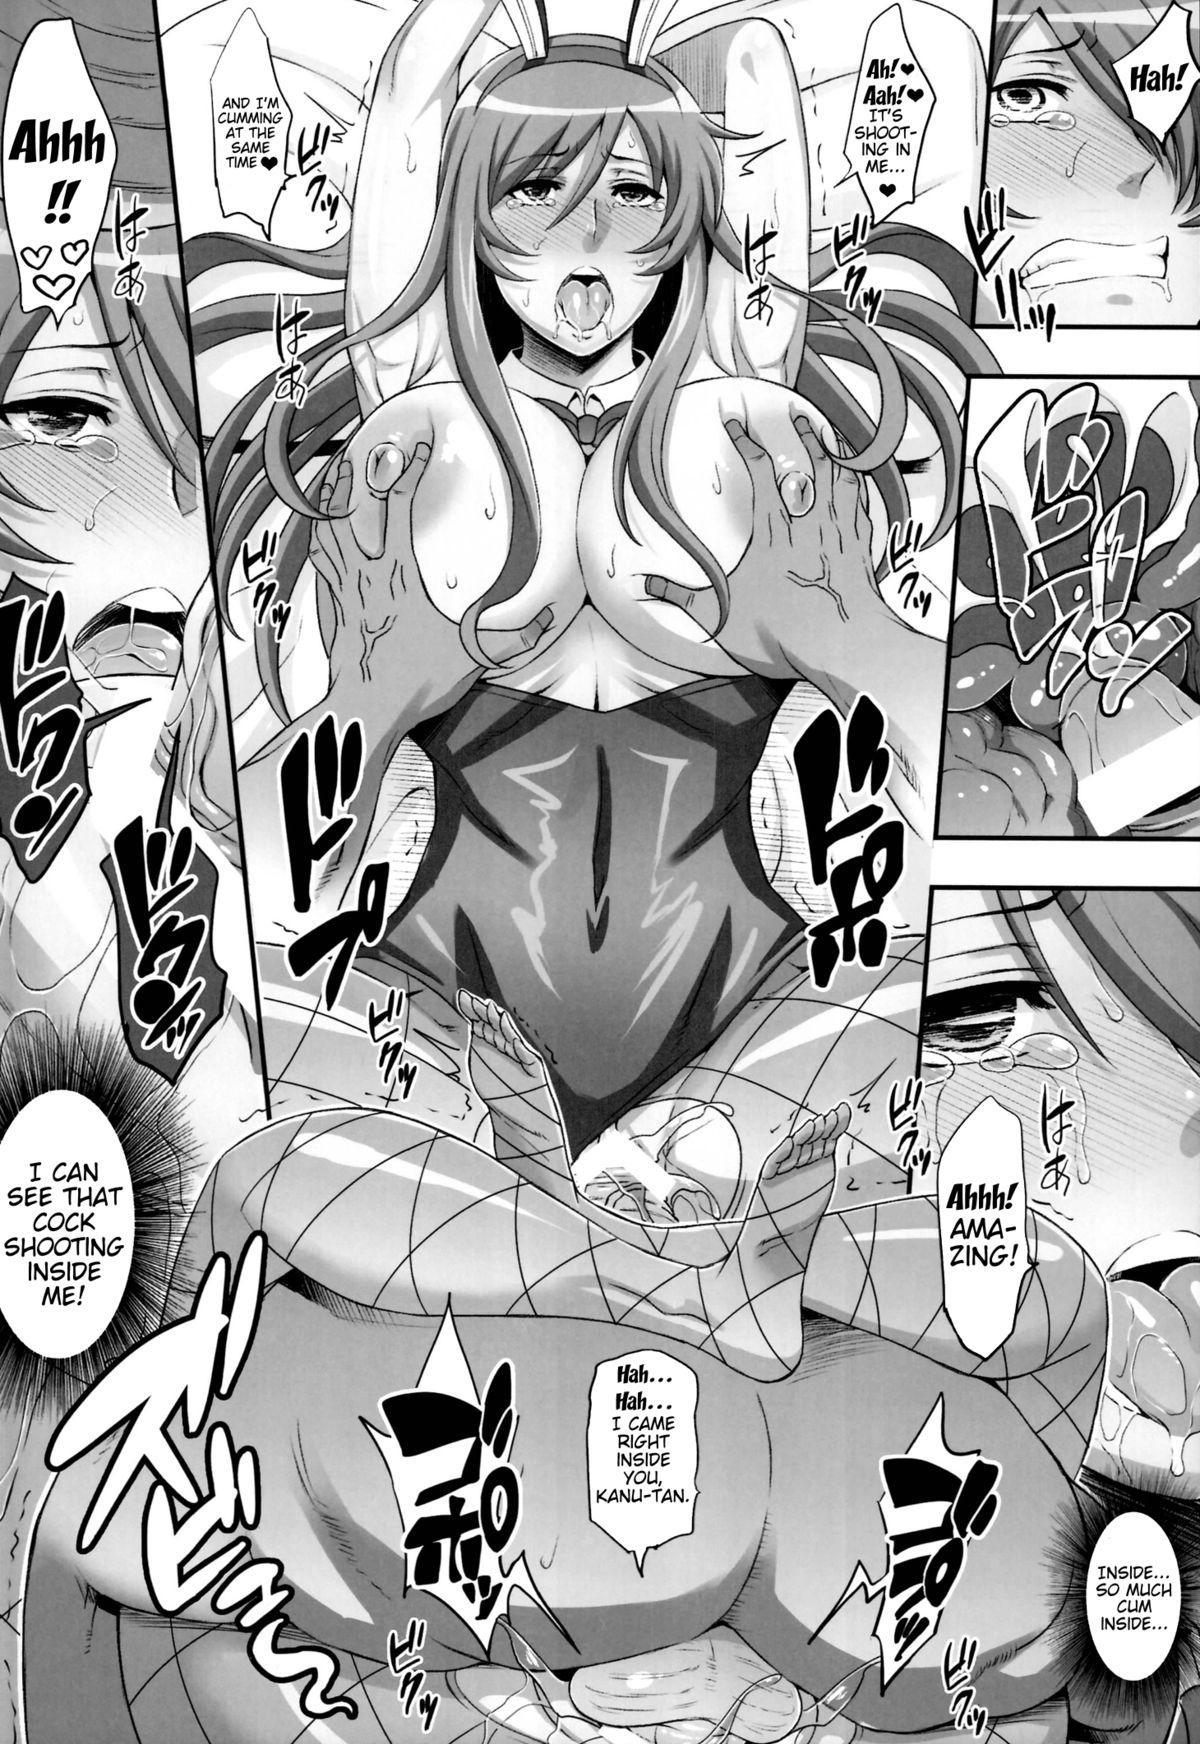 (C86) [Diogenes Club (Haikawa Hemlen)] Shokukan Mankan Zenseki Go Touki Ryoujoku   Shokukan Mankan Zenseki 5 - Princess Rape Battle- Cosplay Kanu (Ikkitousen) [English] {doujin-moe.us} 20